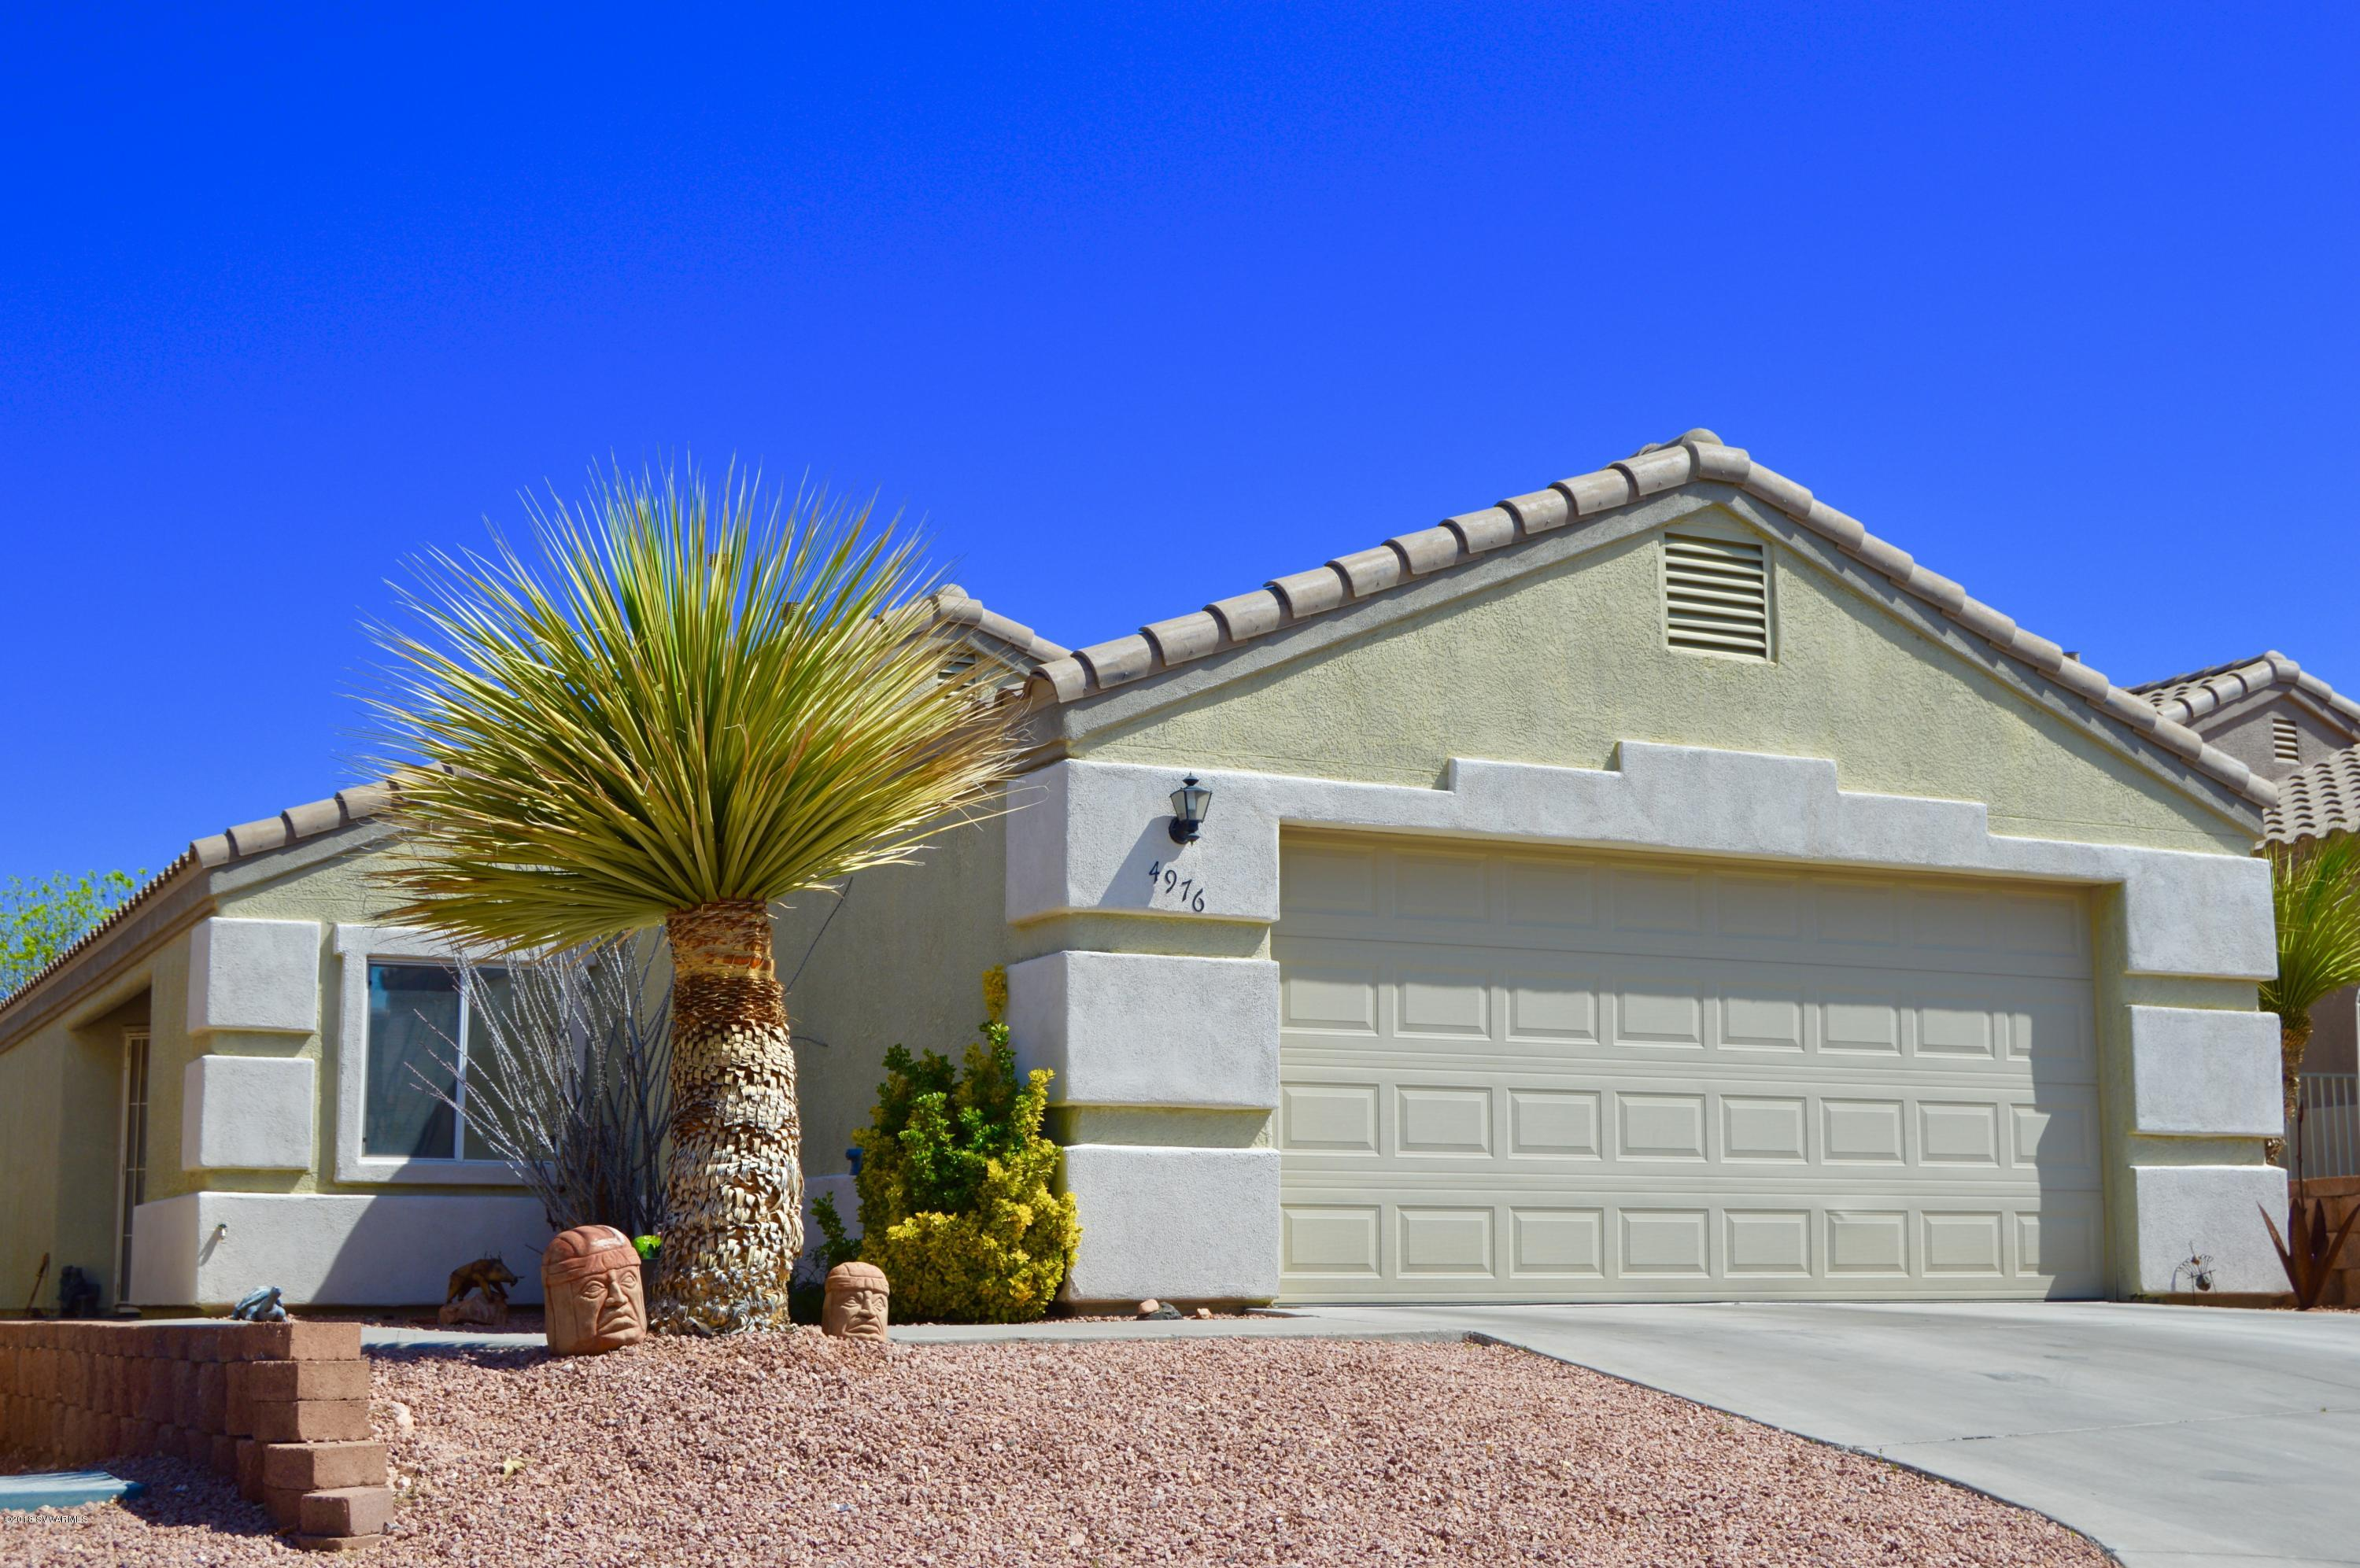 4976 E Catalina Court Cornville, AZ 86325